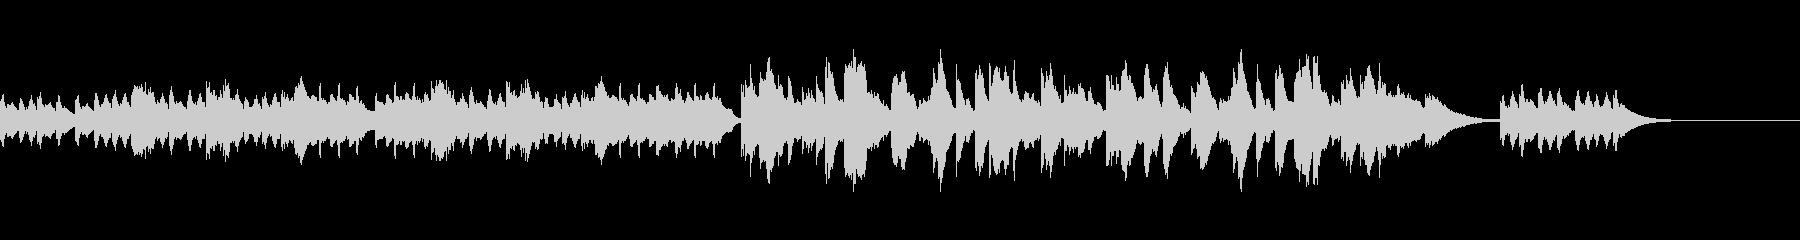 CMなどで使える落ち着いたピアノ曲の未再生の波形